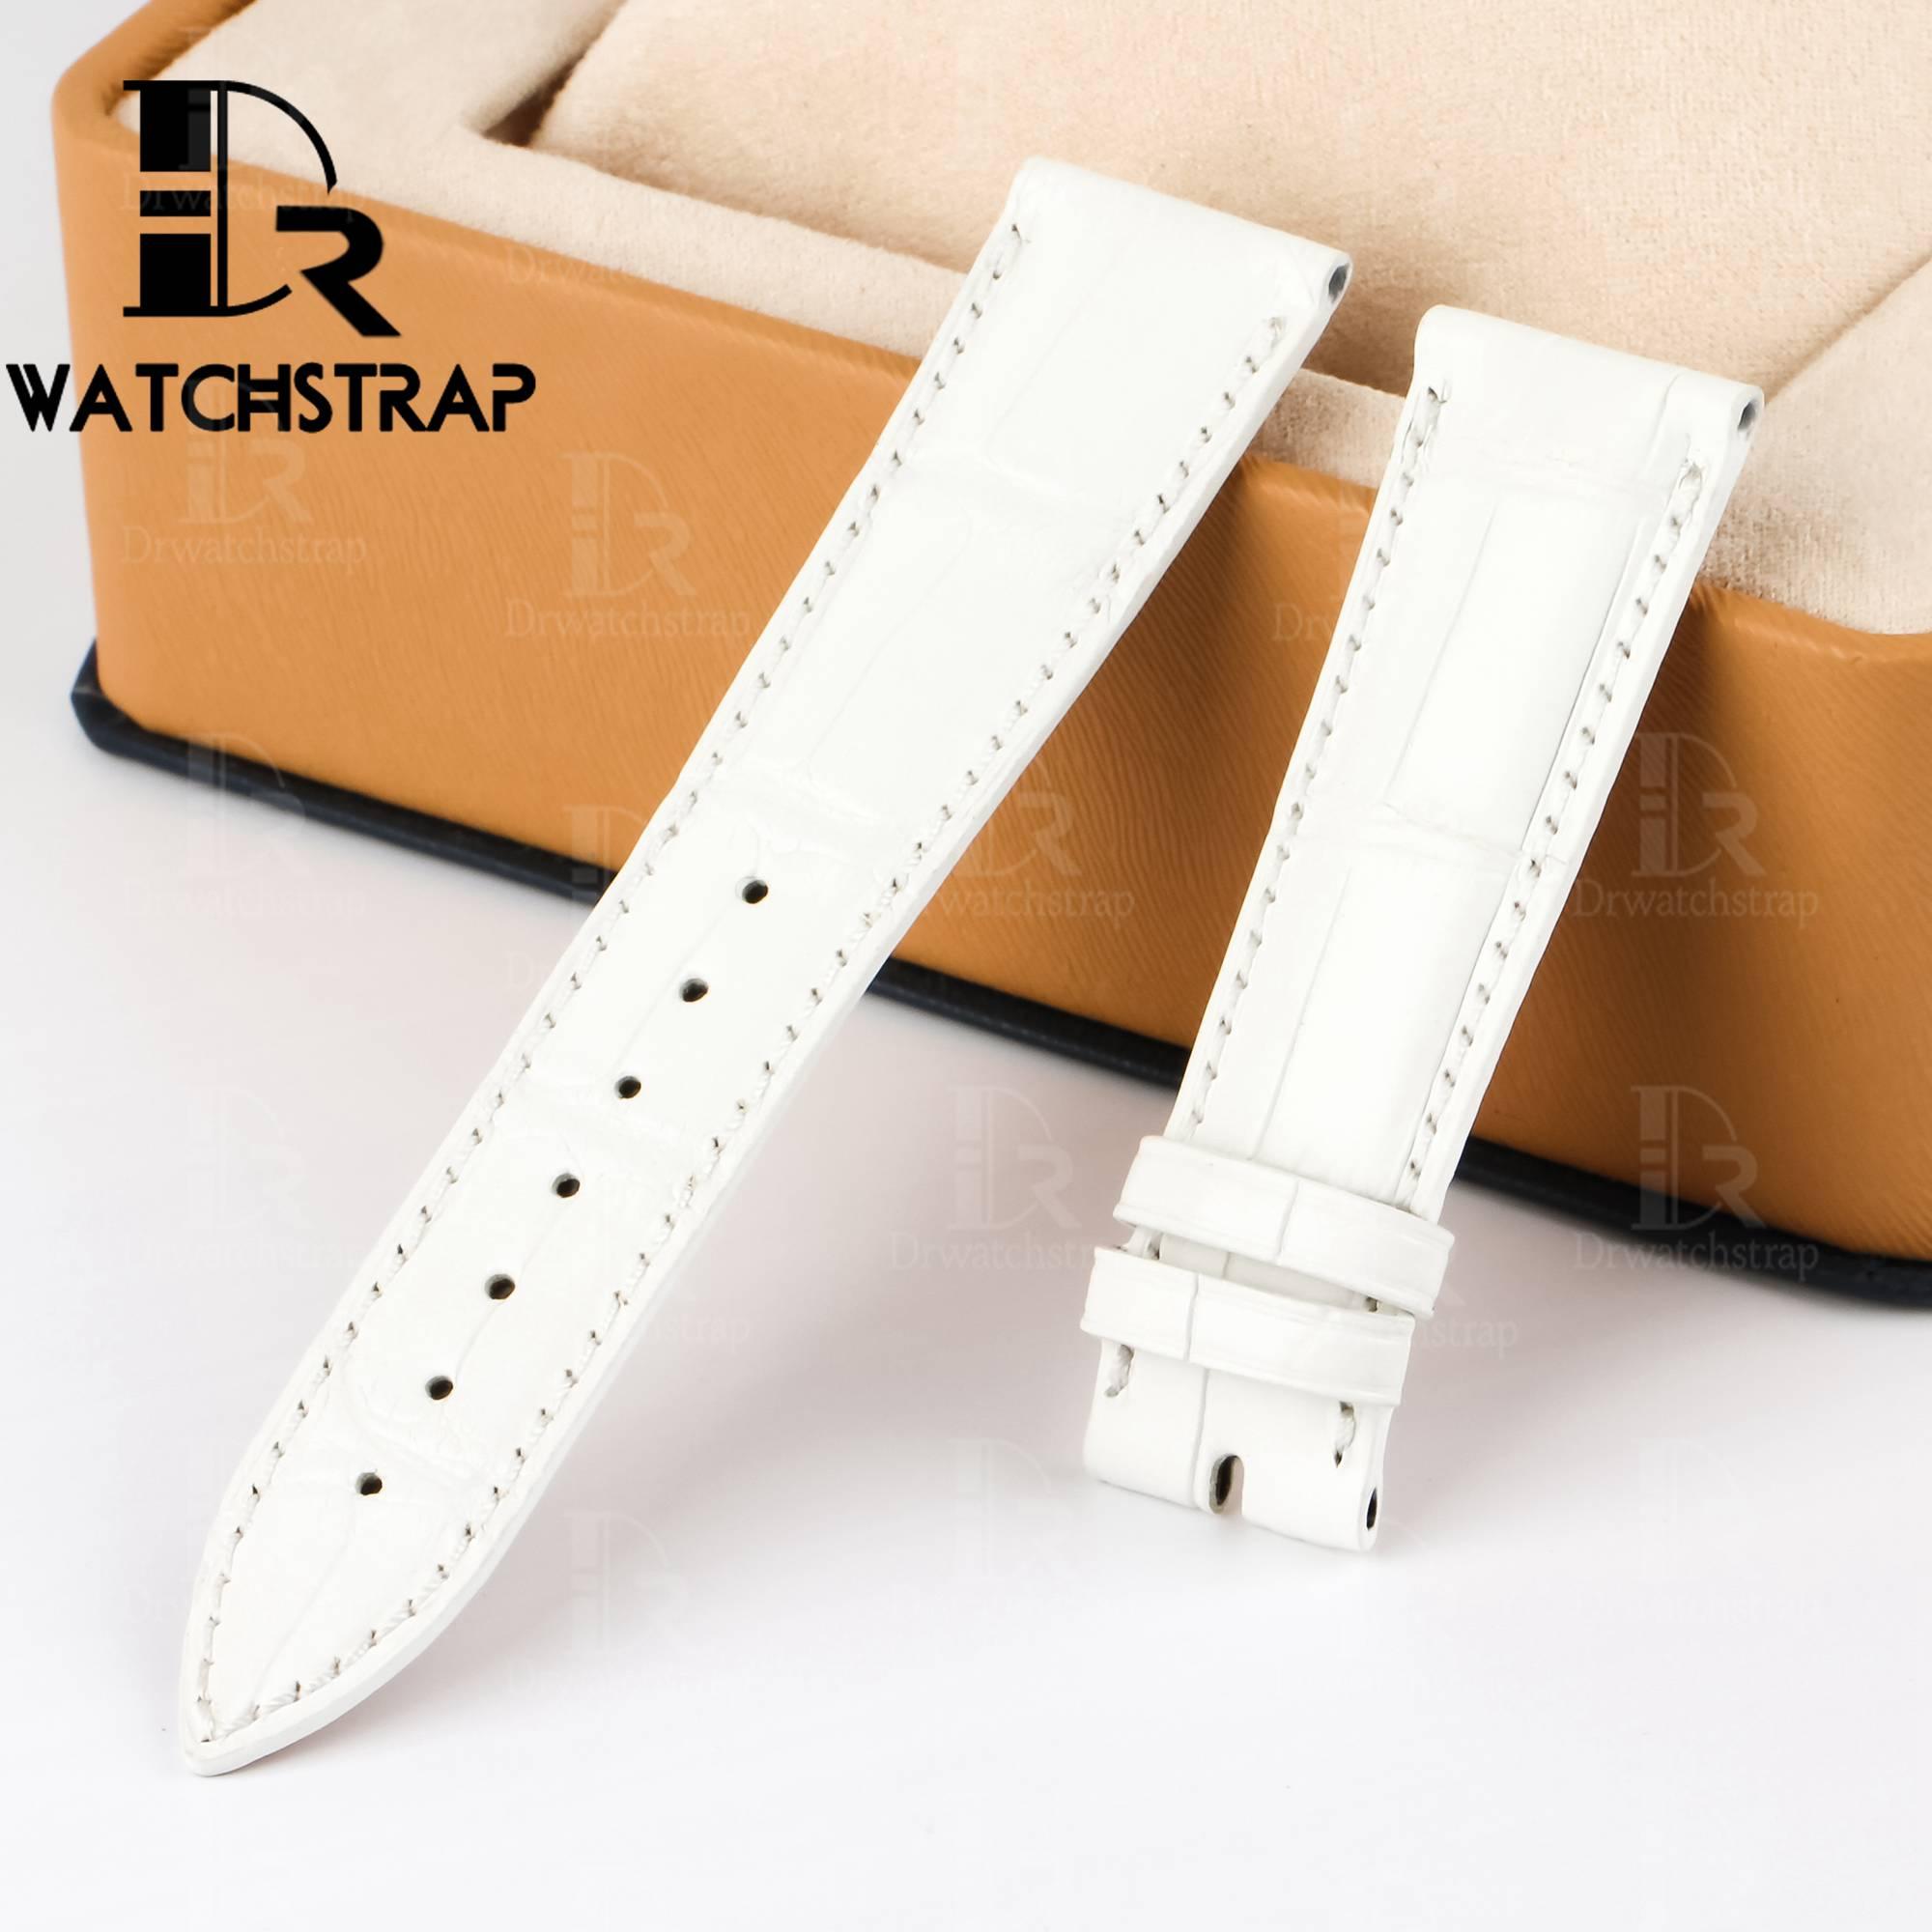 White America Alligator leather watch band strap fot Franck Muller CASABLANCA 8880 color dreams wristwatch